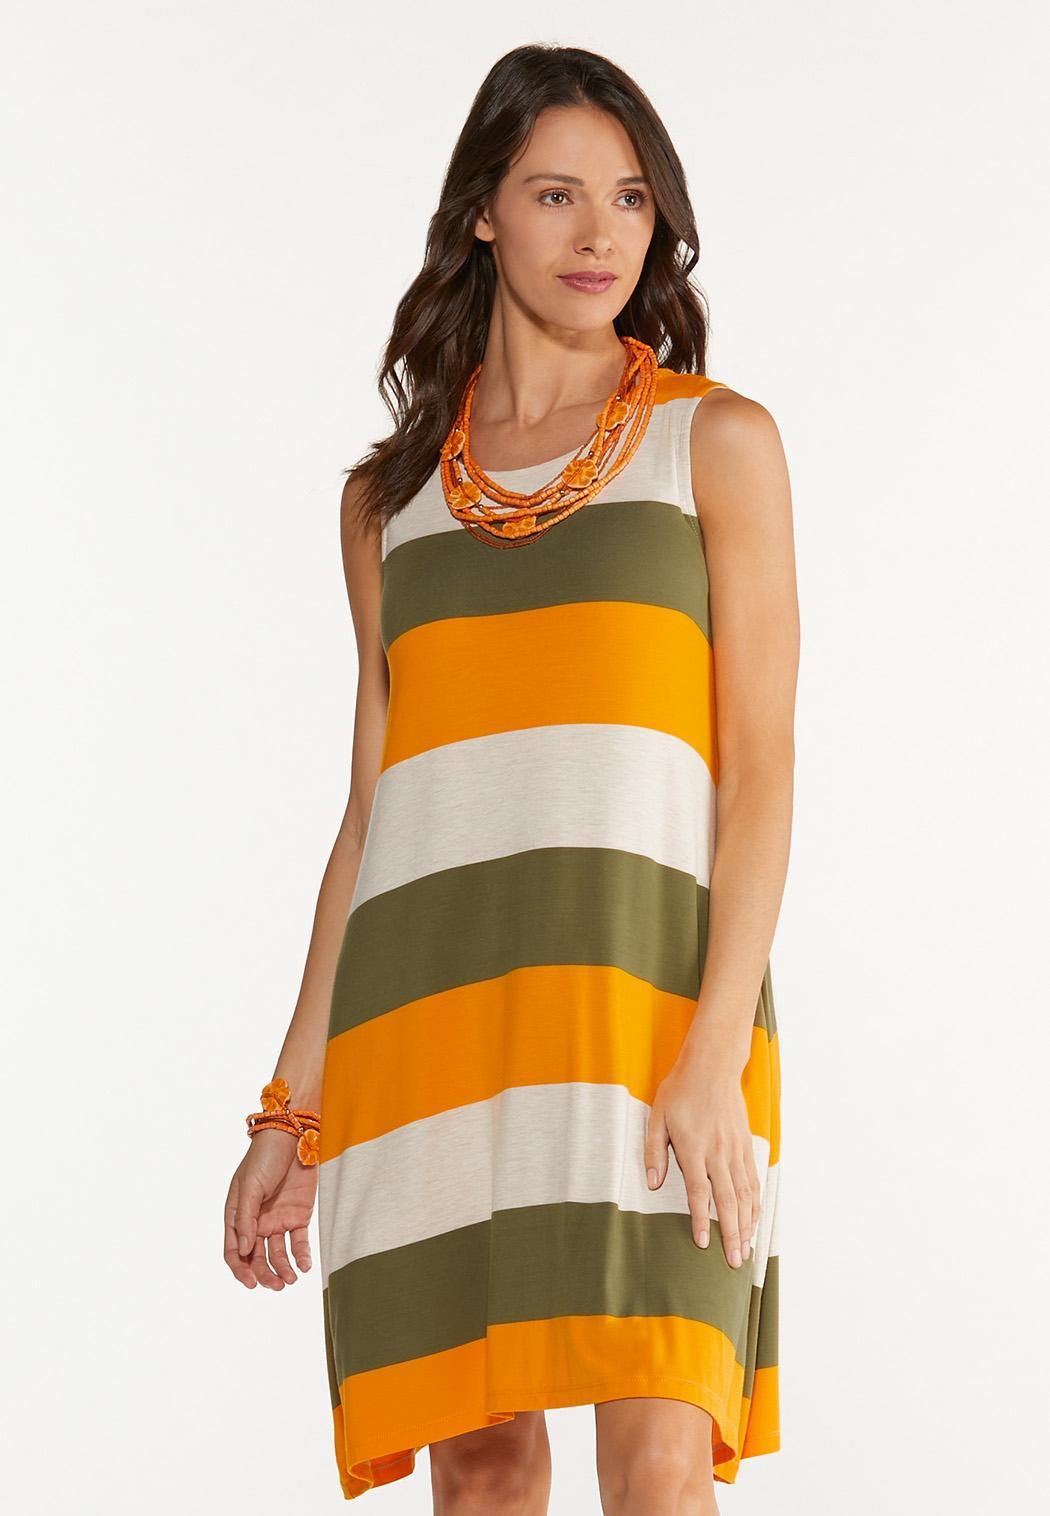 Citrus Colorblock Dress